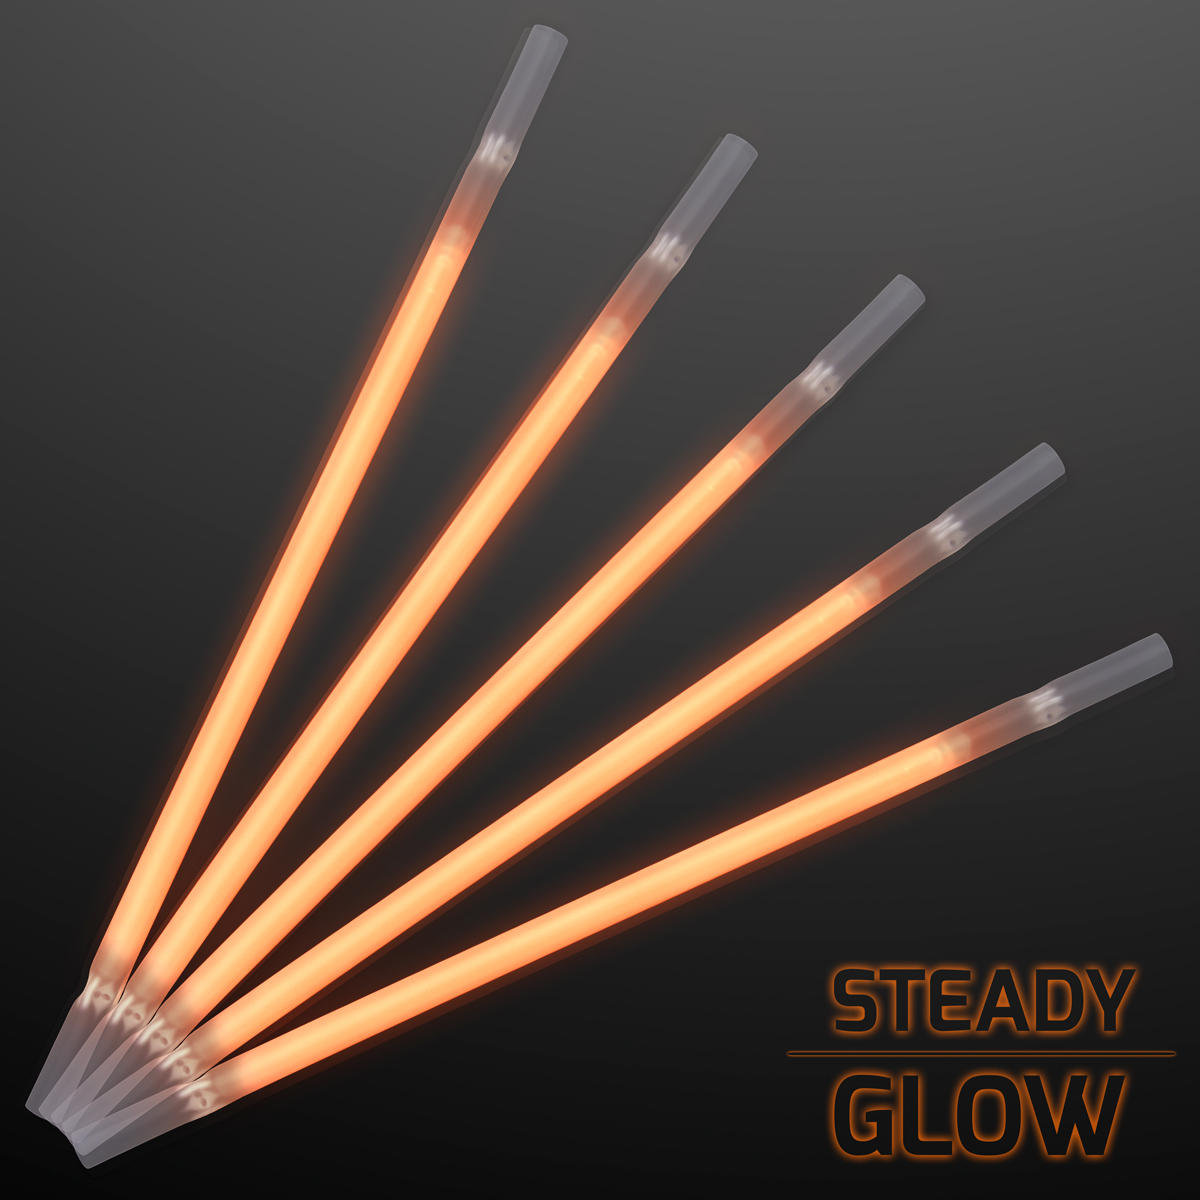 FlashingBlinkyLights Glow Stick Drinking Straws (Set of 25)